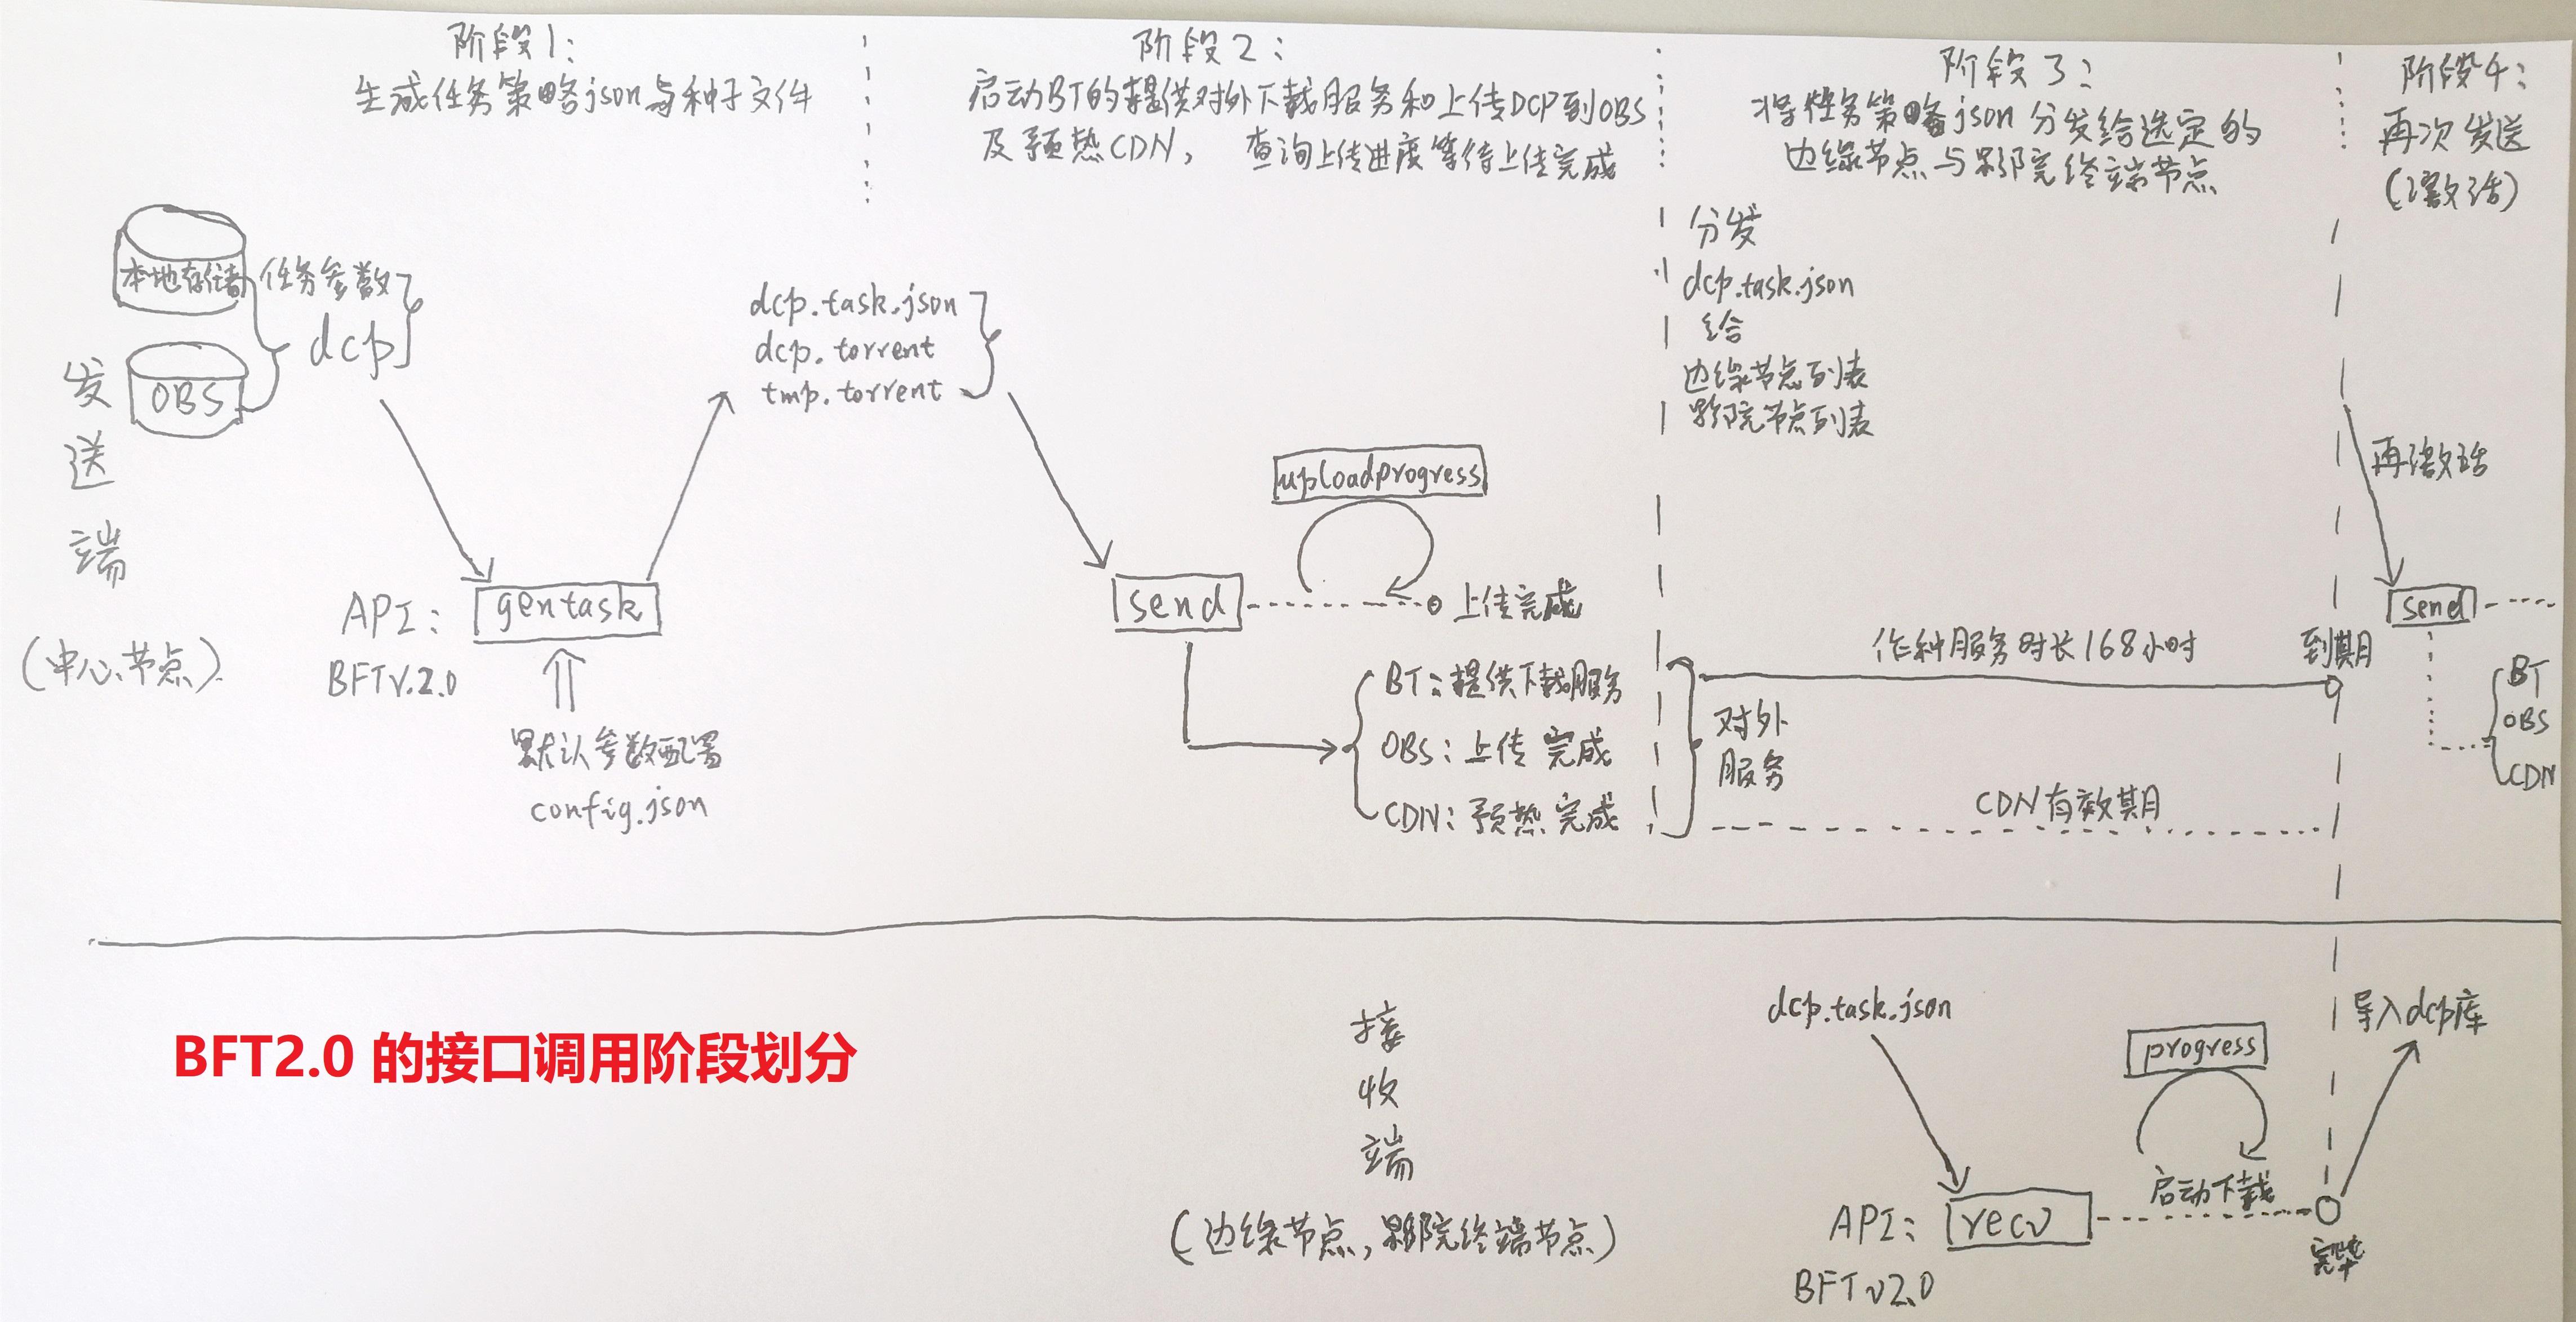 BFTv2.0接口的业务阶段划分示意图美图.jpg-1762.9kB